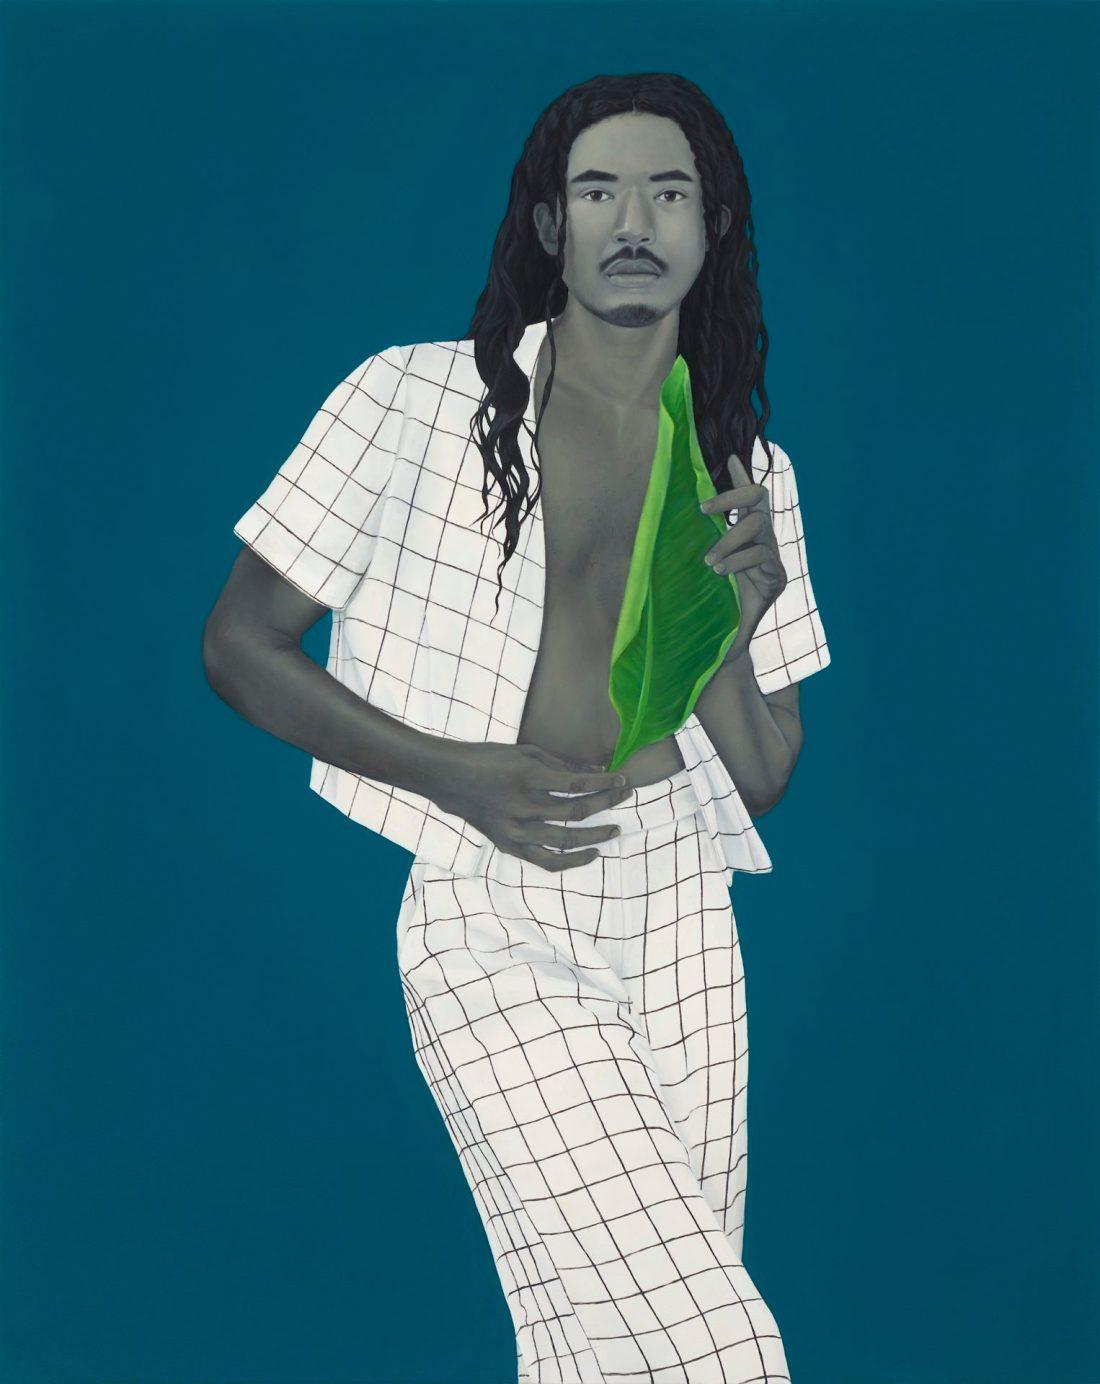 Amy Sherald, African American Art, African American Artist, Black Artist, KOLUMN Magazine, KOLUMN